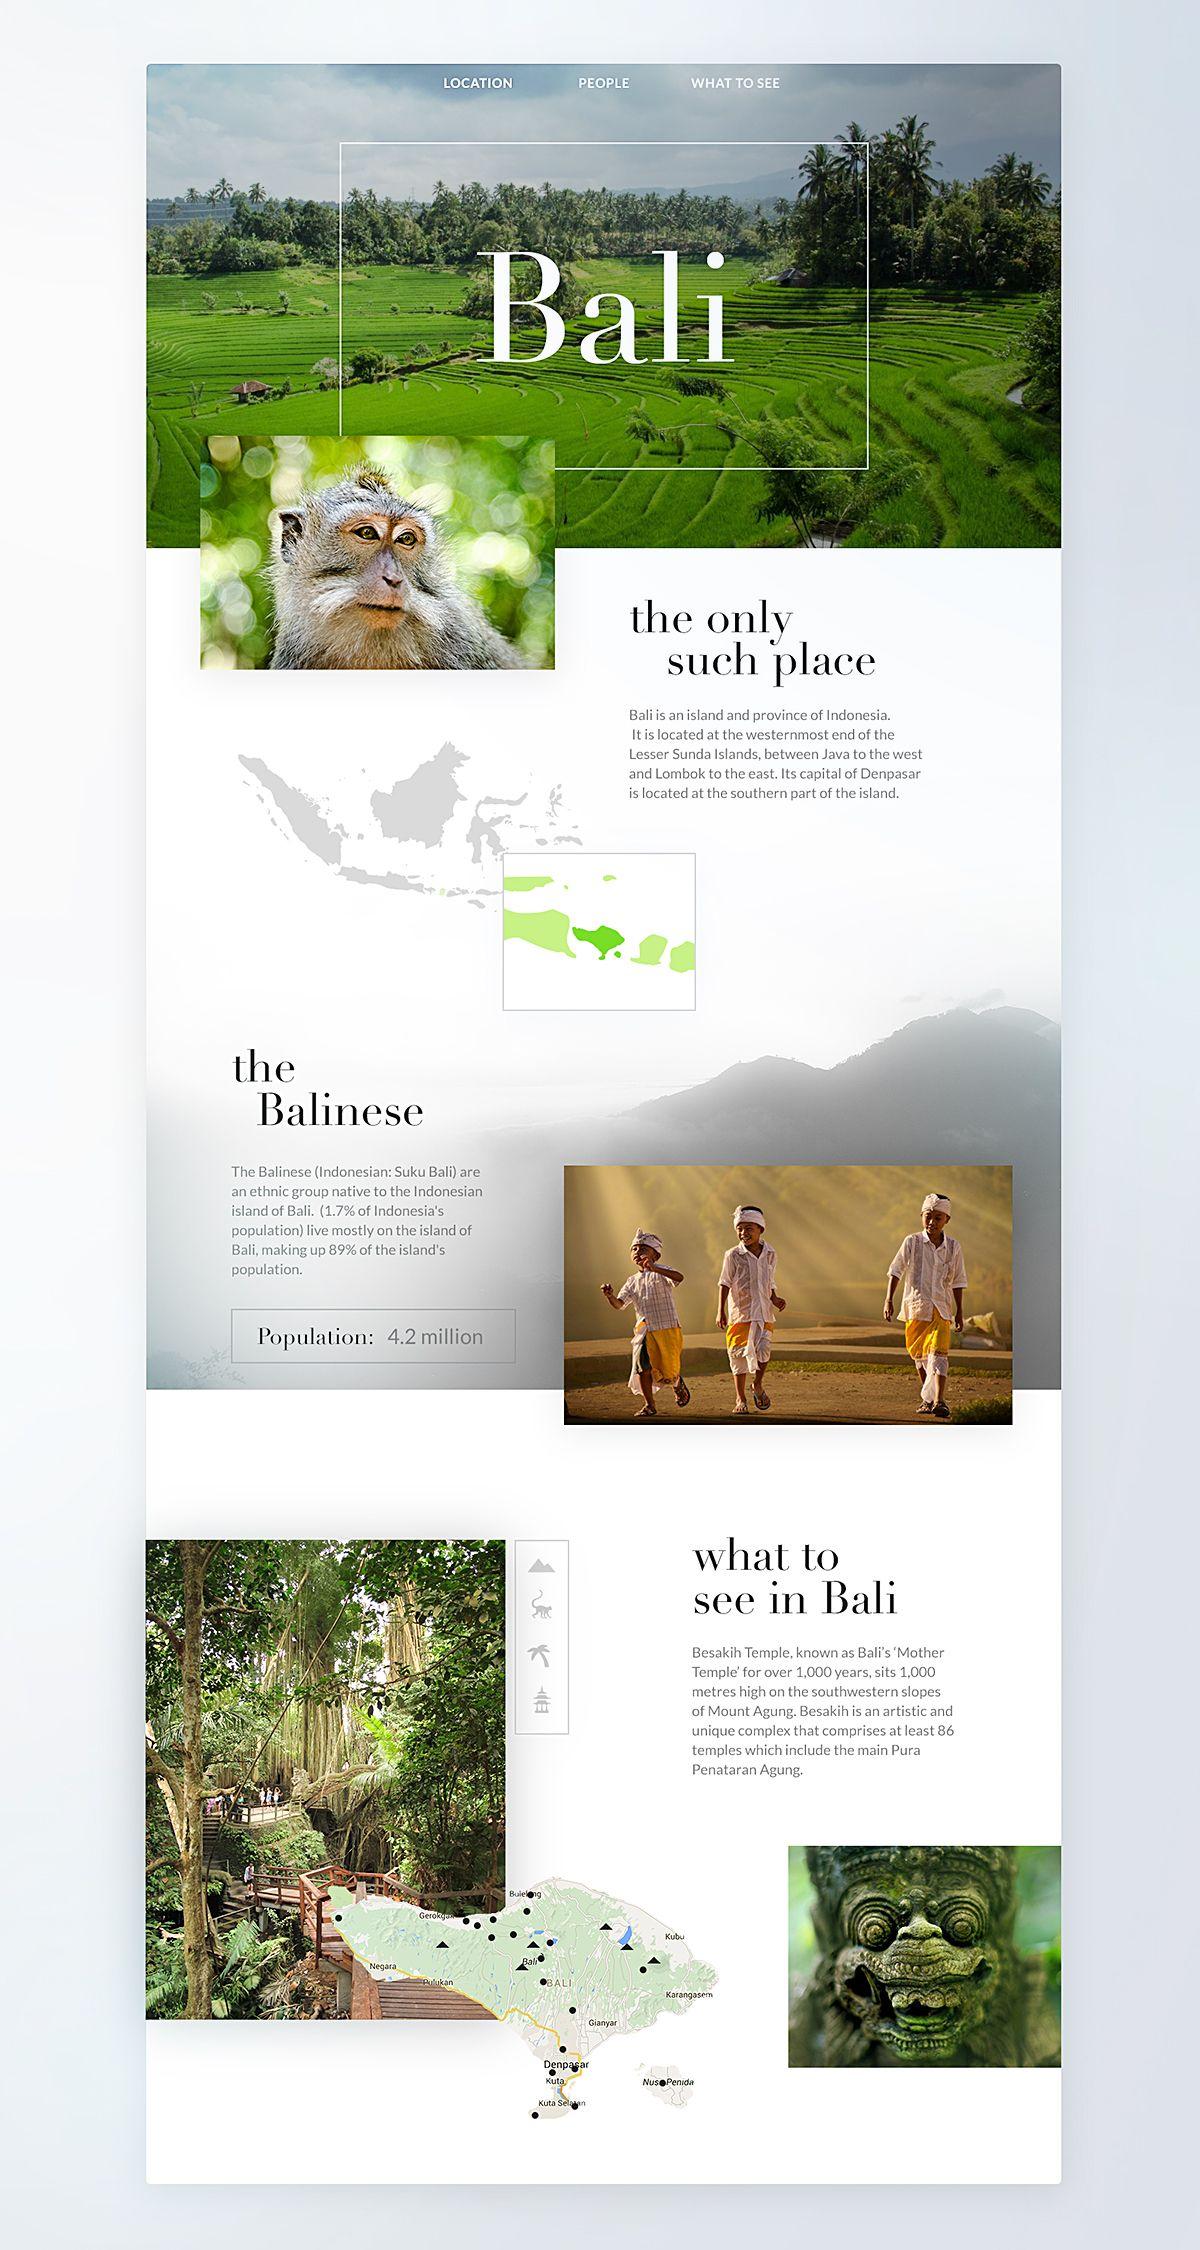 Bali Big Jpg By Natalia Berowska Travel Website Design Travel Blog Design Creative Web Design